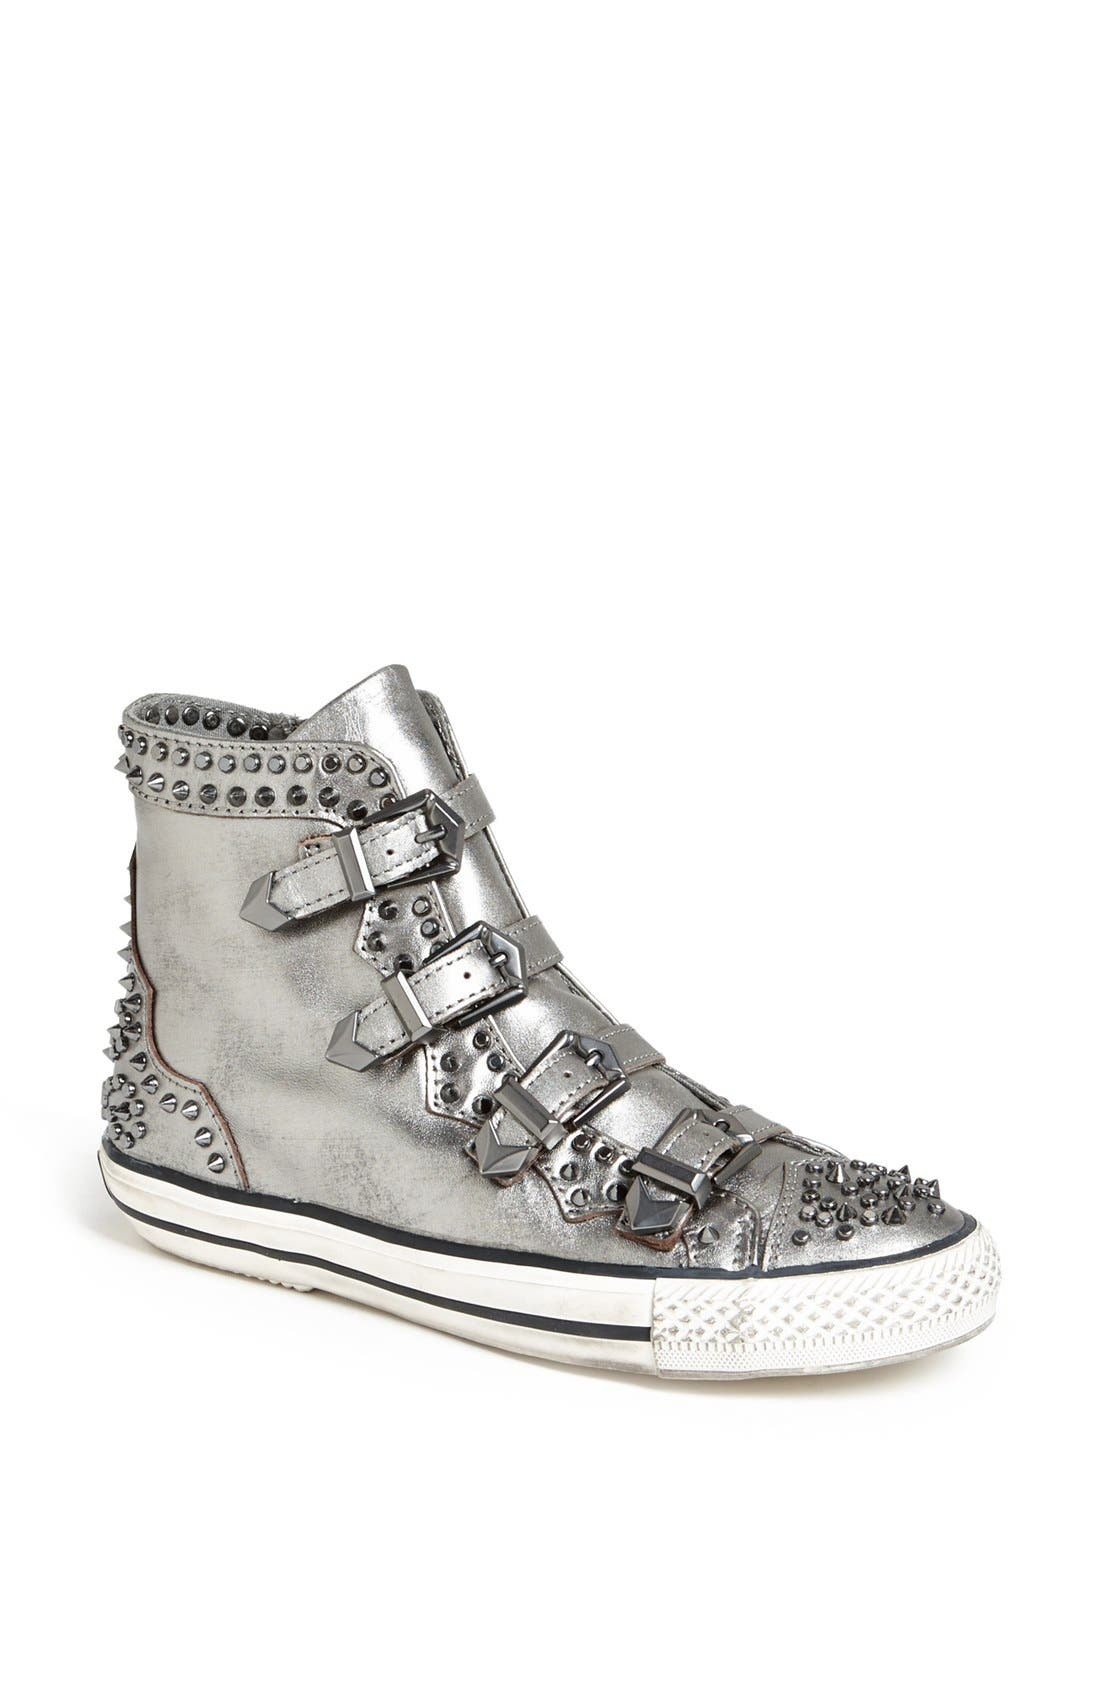 Alternate Image 1 Selected - Ash 'Viking' Spiked Metallic Leather Sneaker